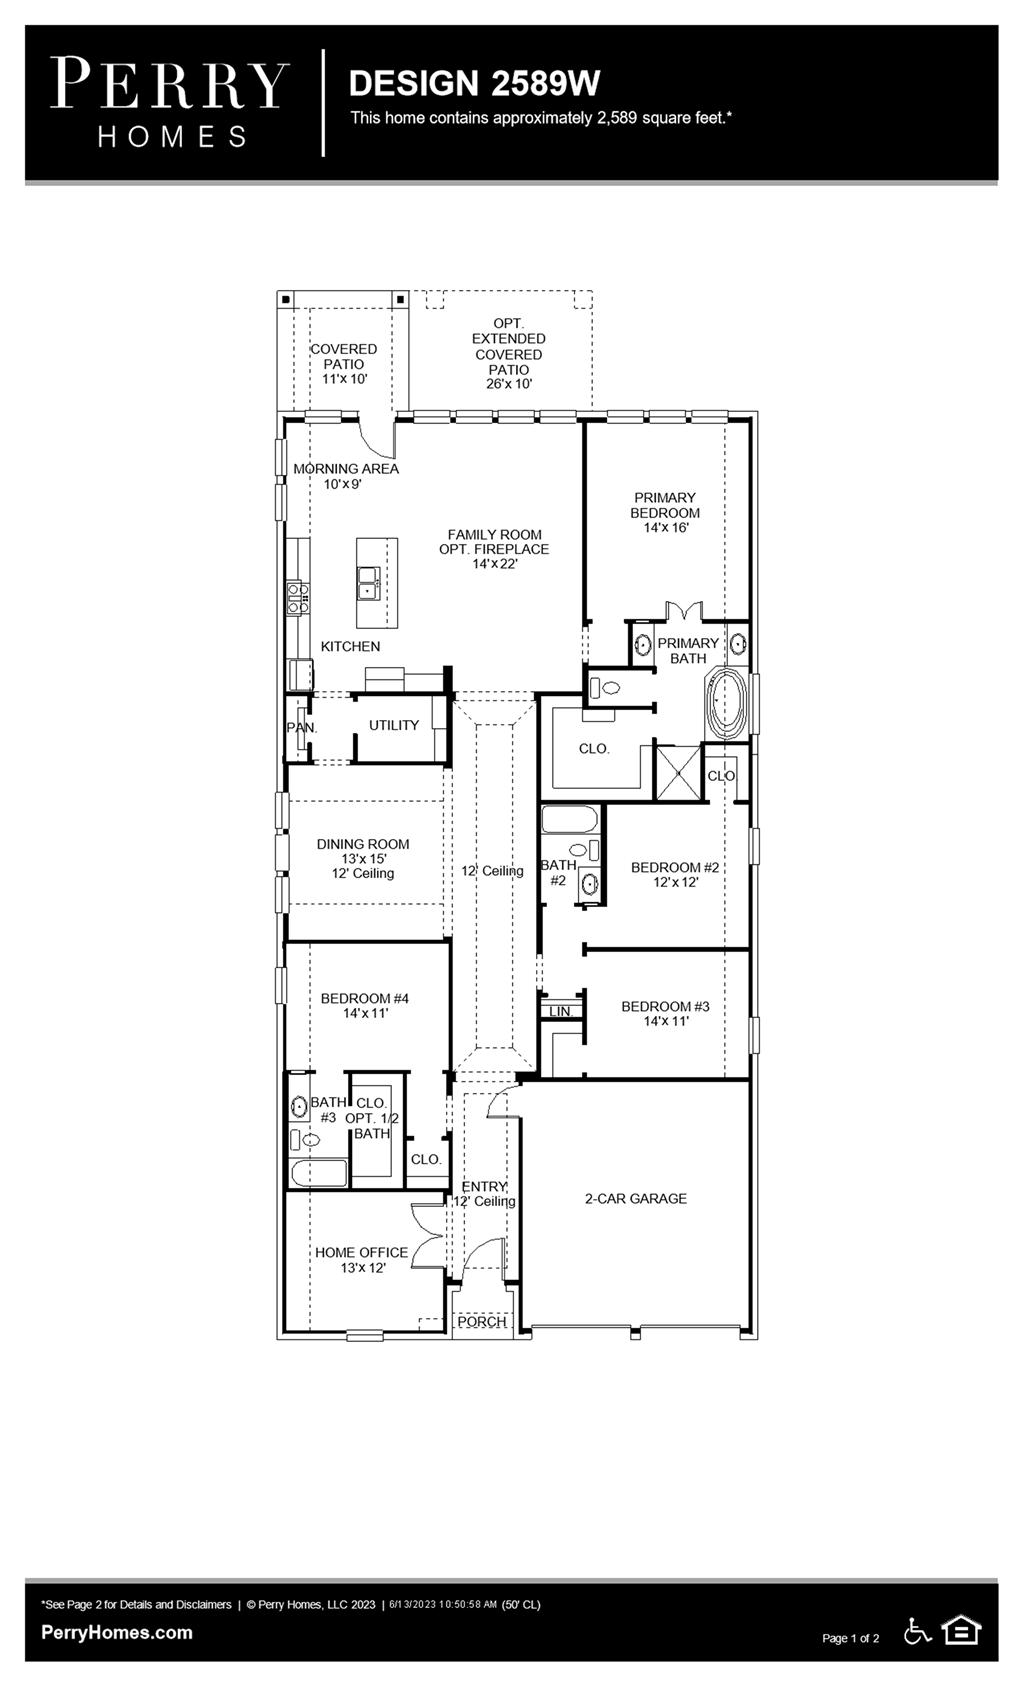 Floor Plan for 2589W